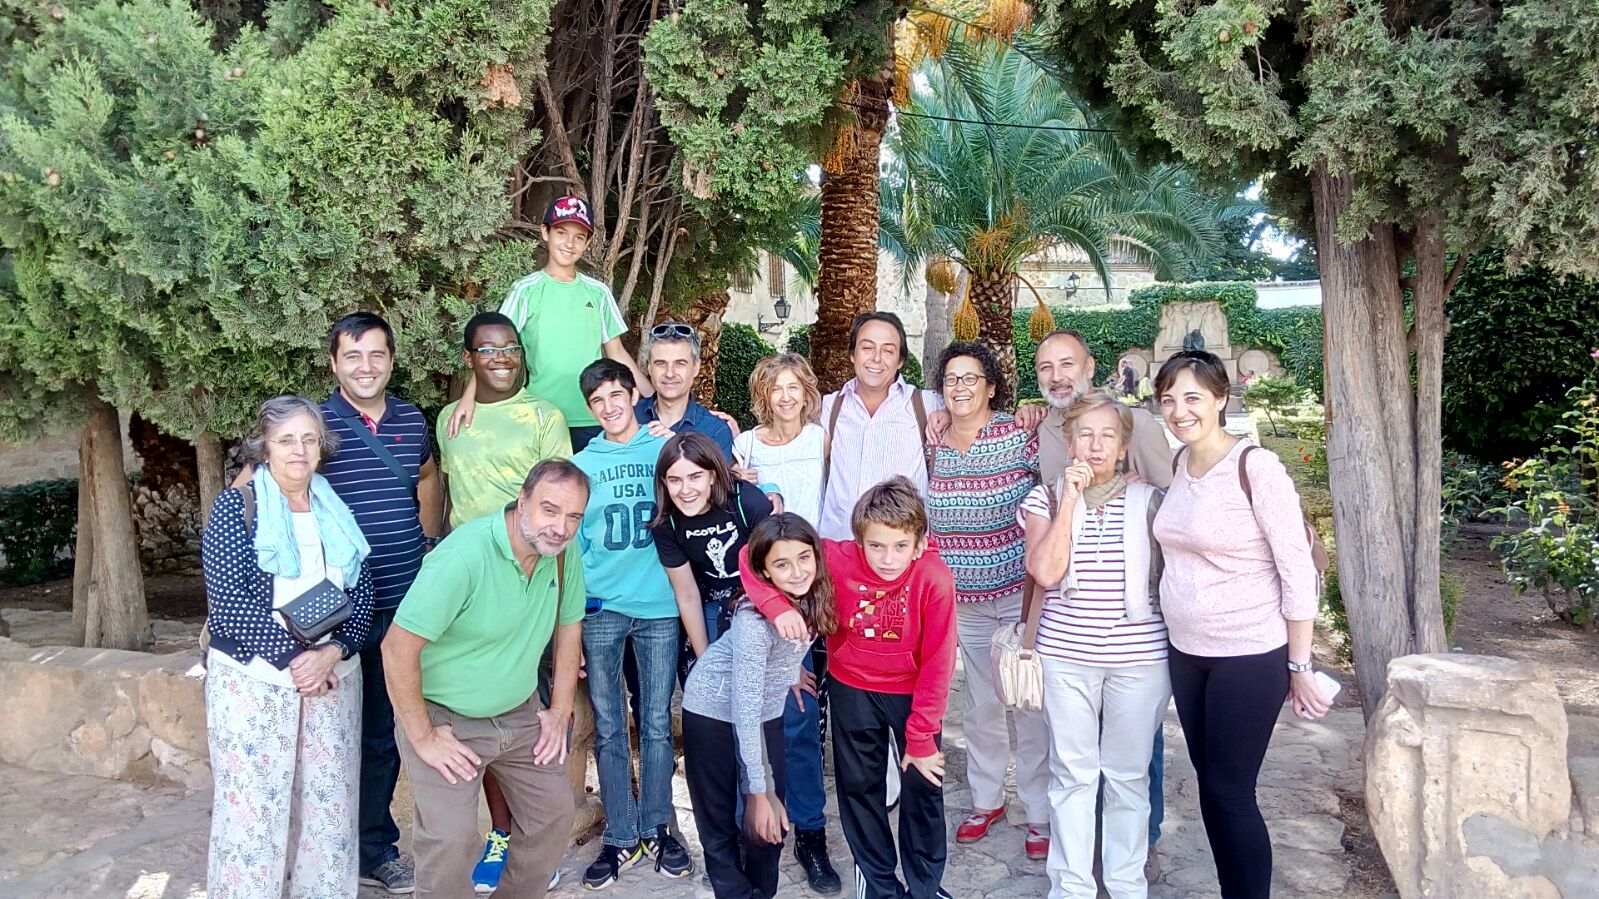 OCASHA Castilla La Mancha se reúne en El Toboso